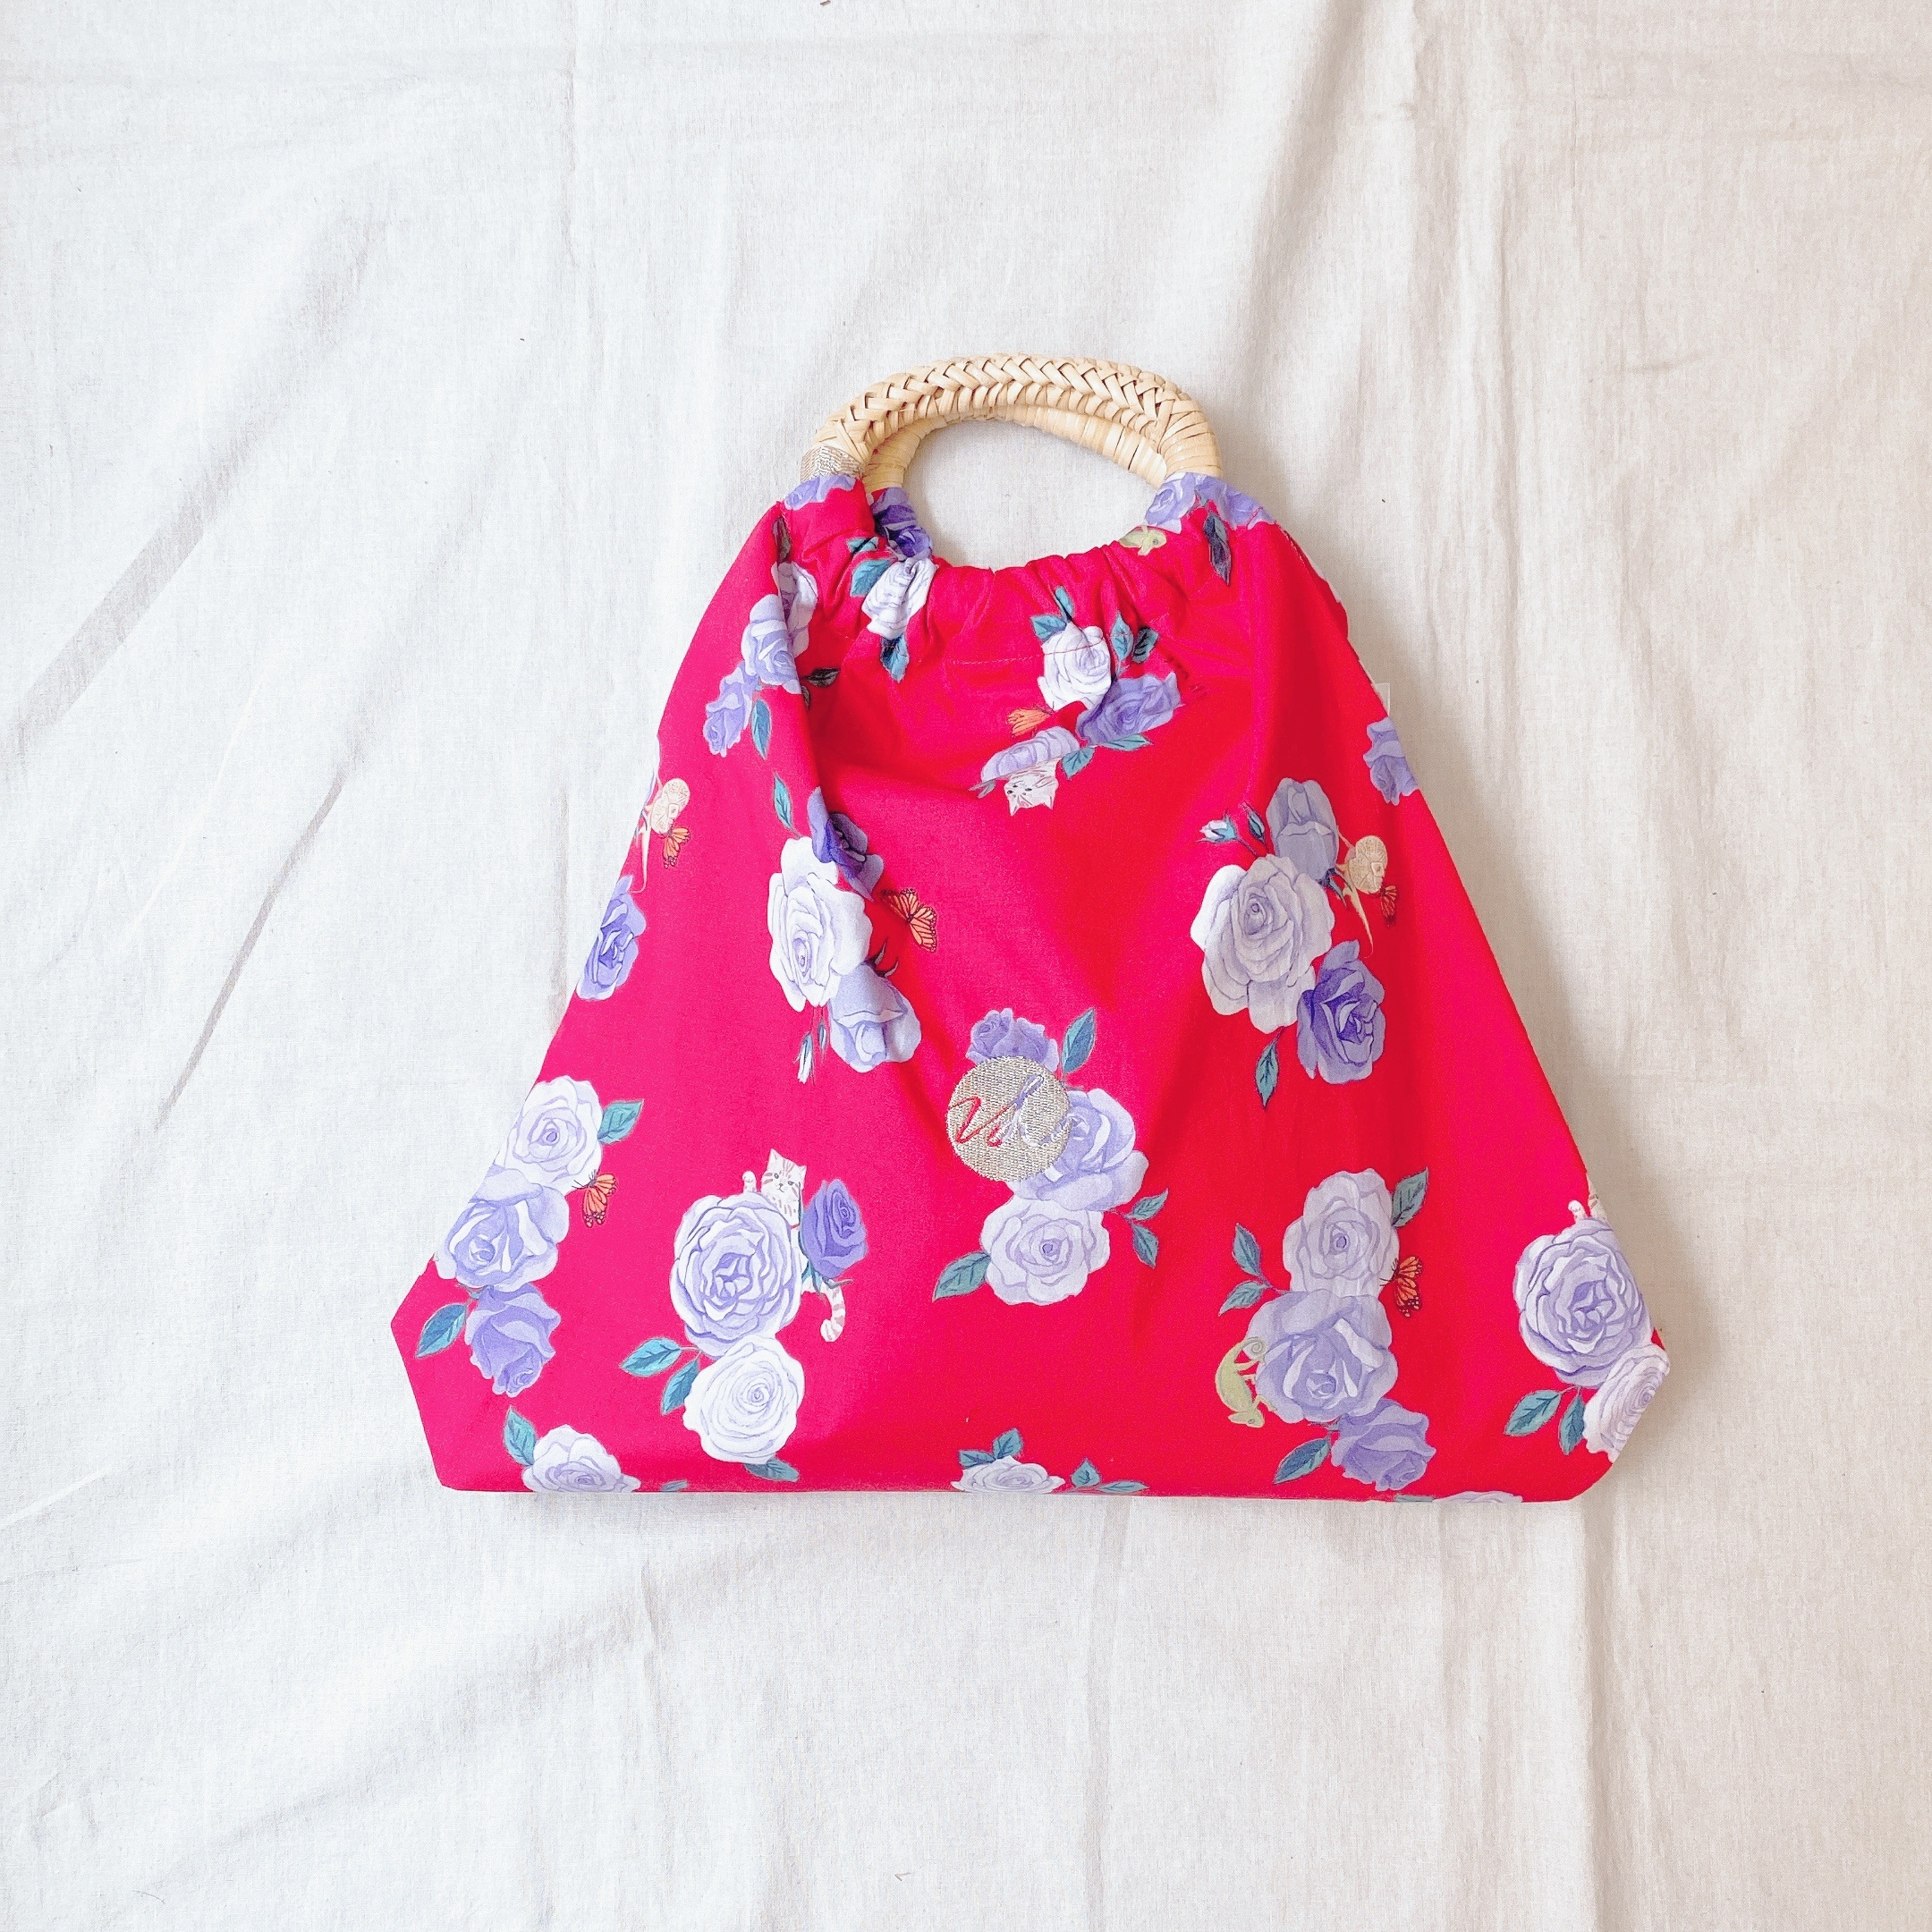 VL by VEE Rattan Bracelet Bag